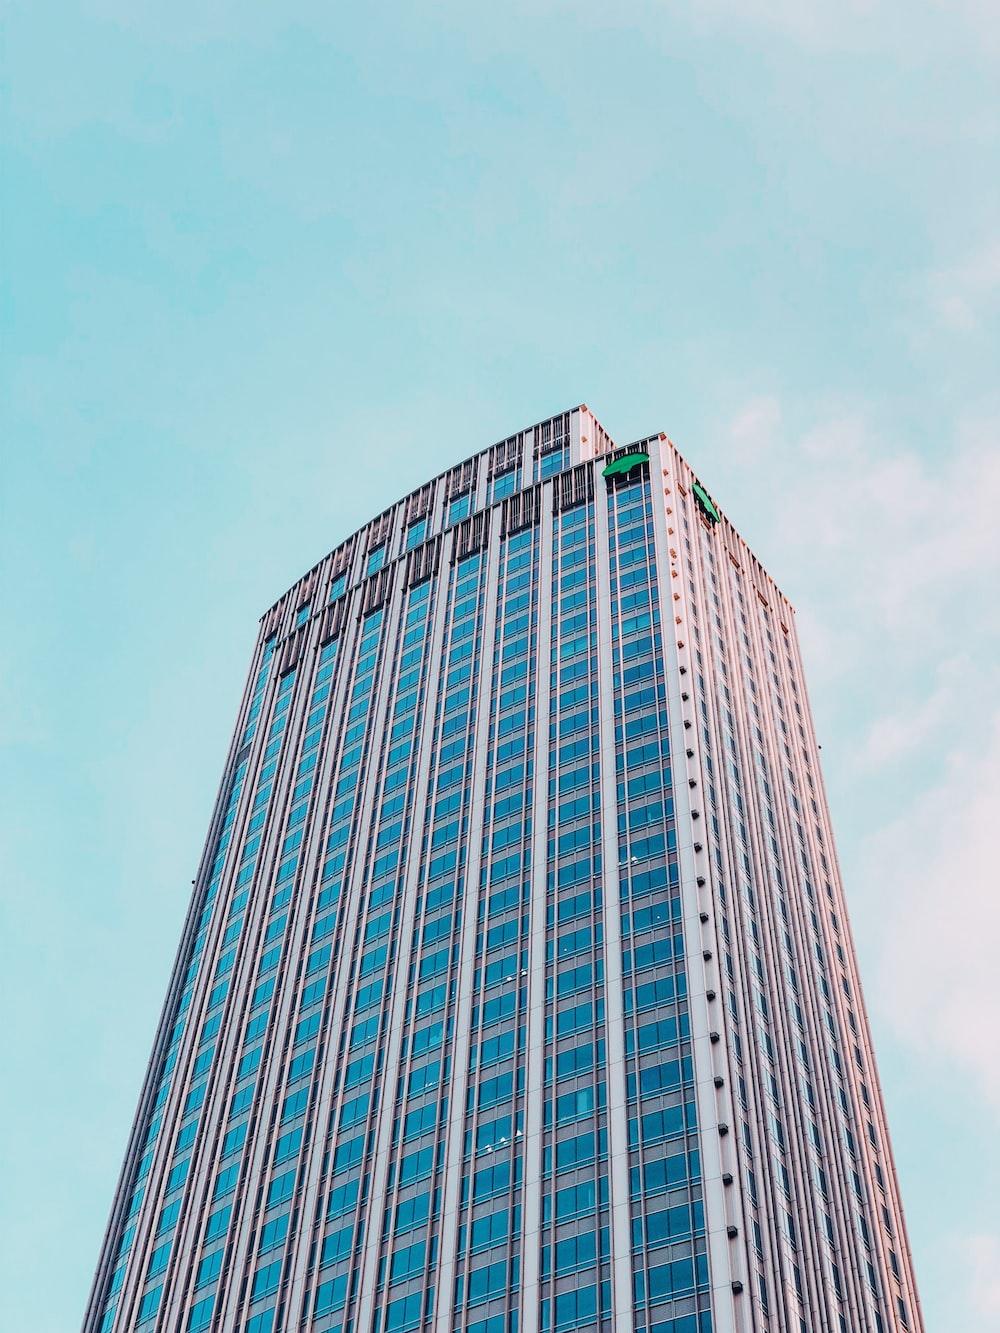 grey concrete high-rise building